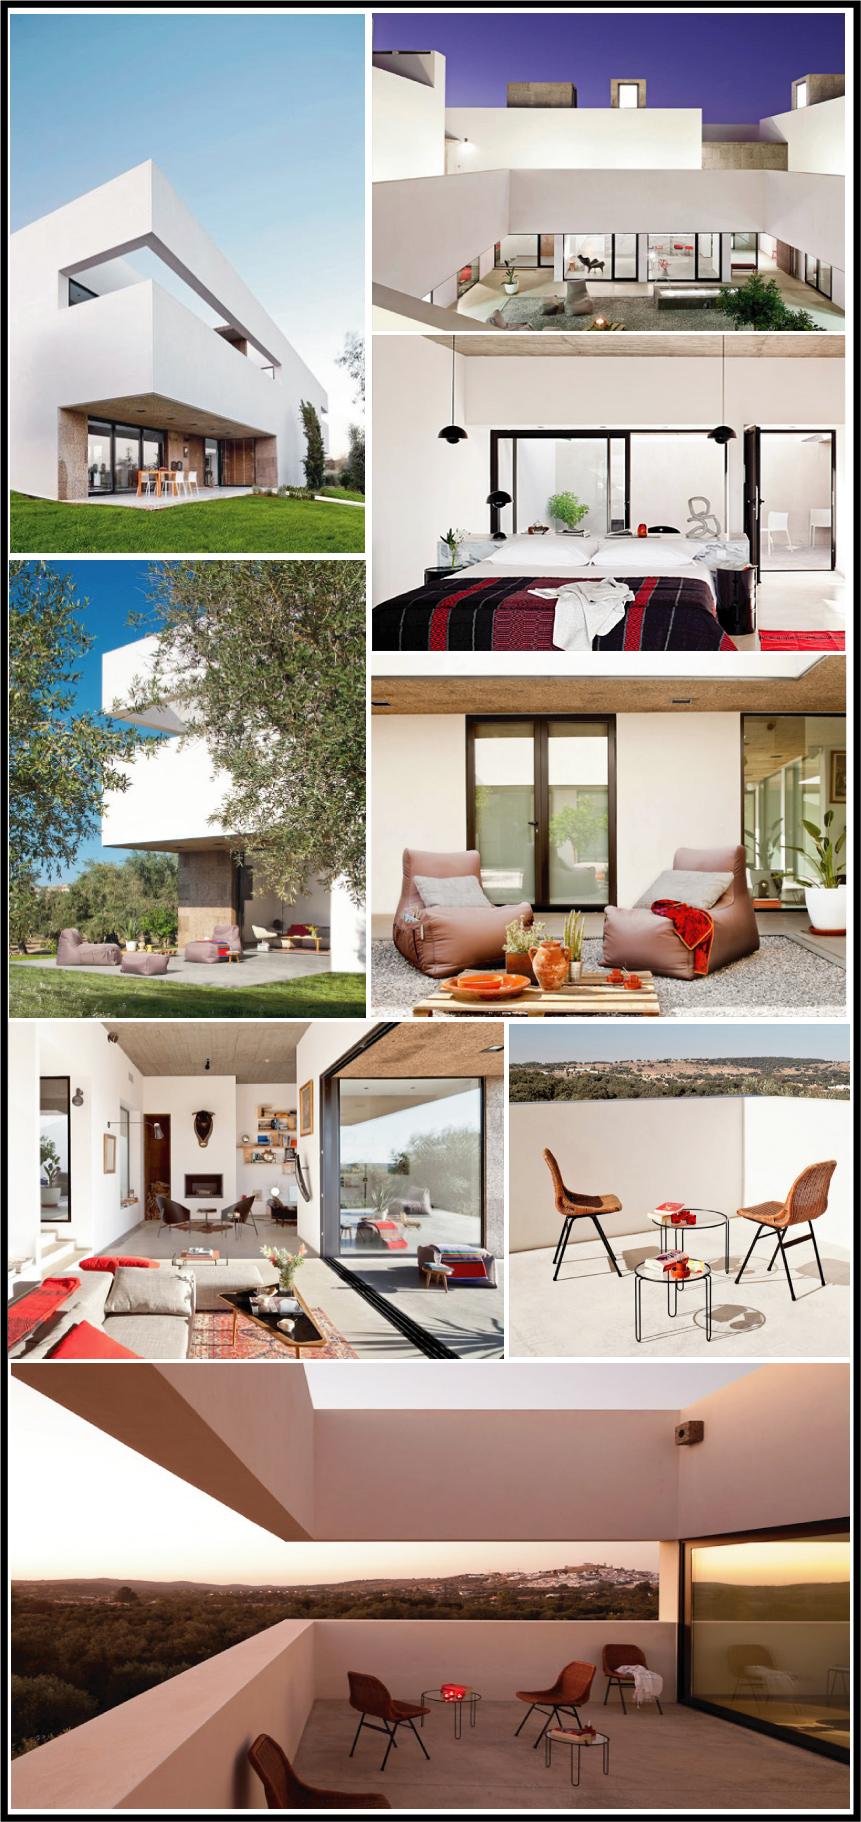 Villa-extramuros-portugal-refuge hors du temps au portugal par chiara stella home